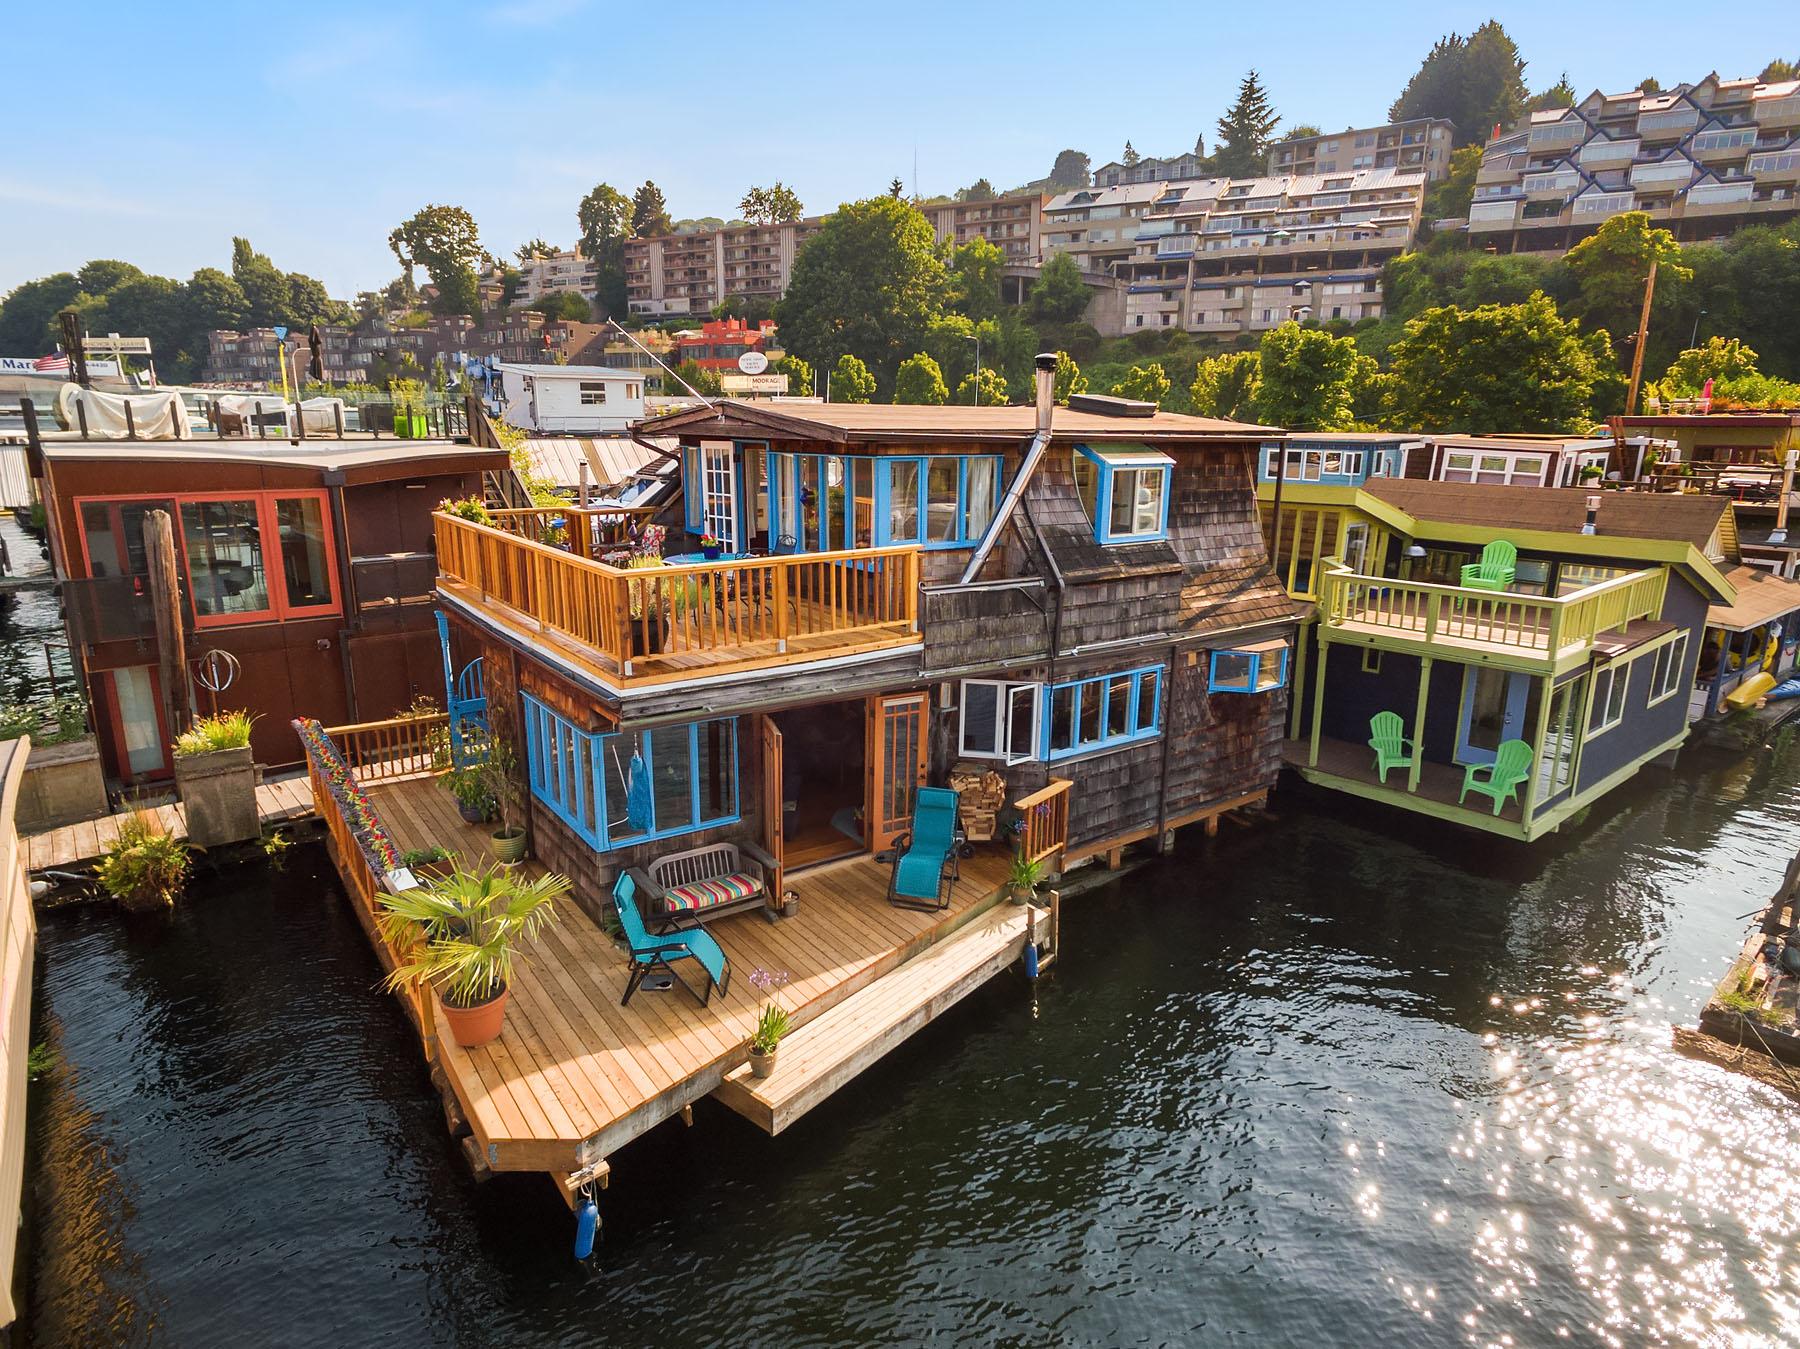 Westlake floating homes for sale on Lake Union